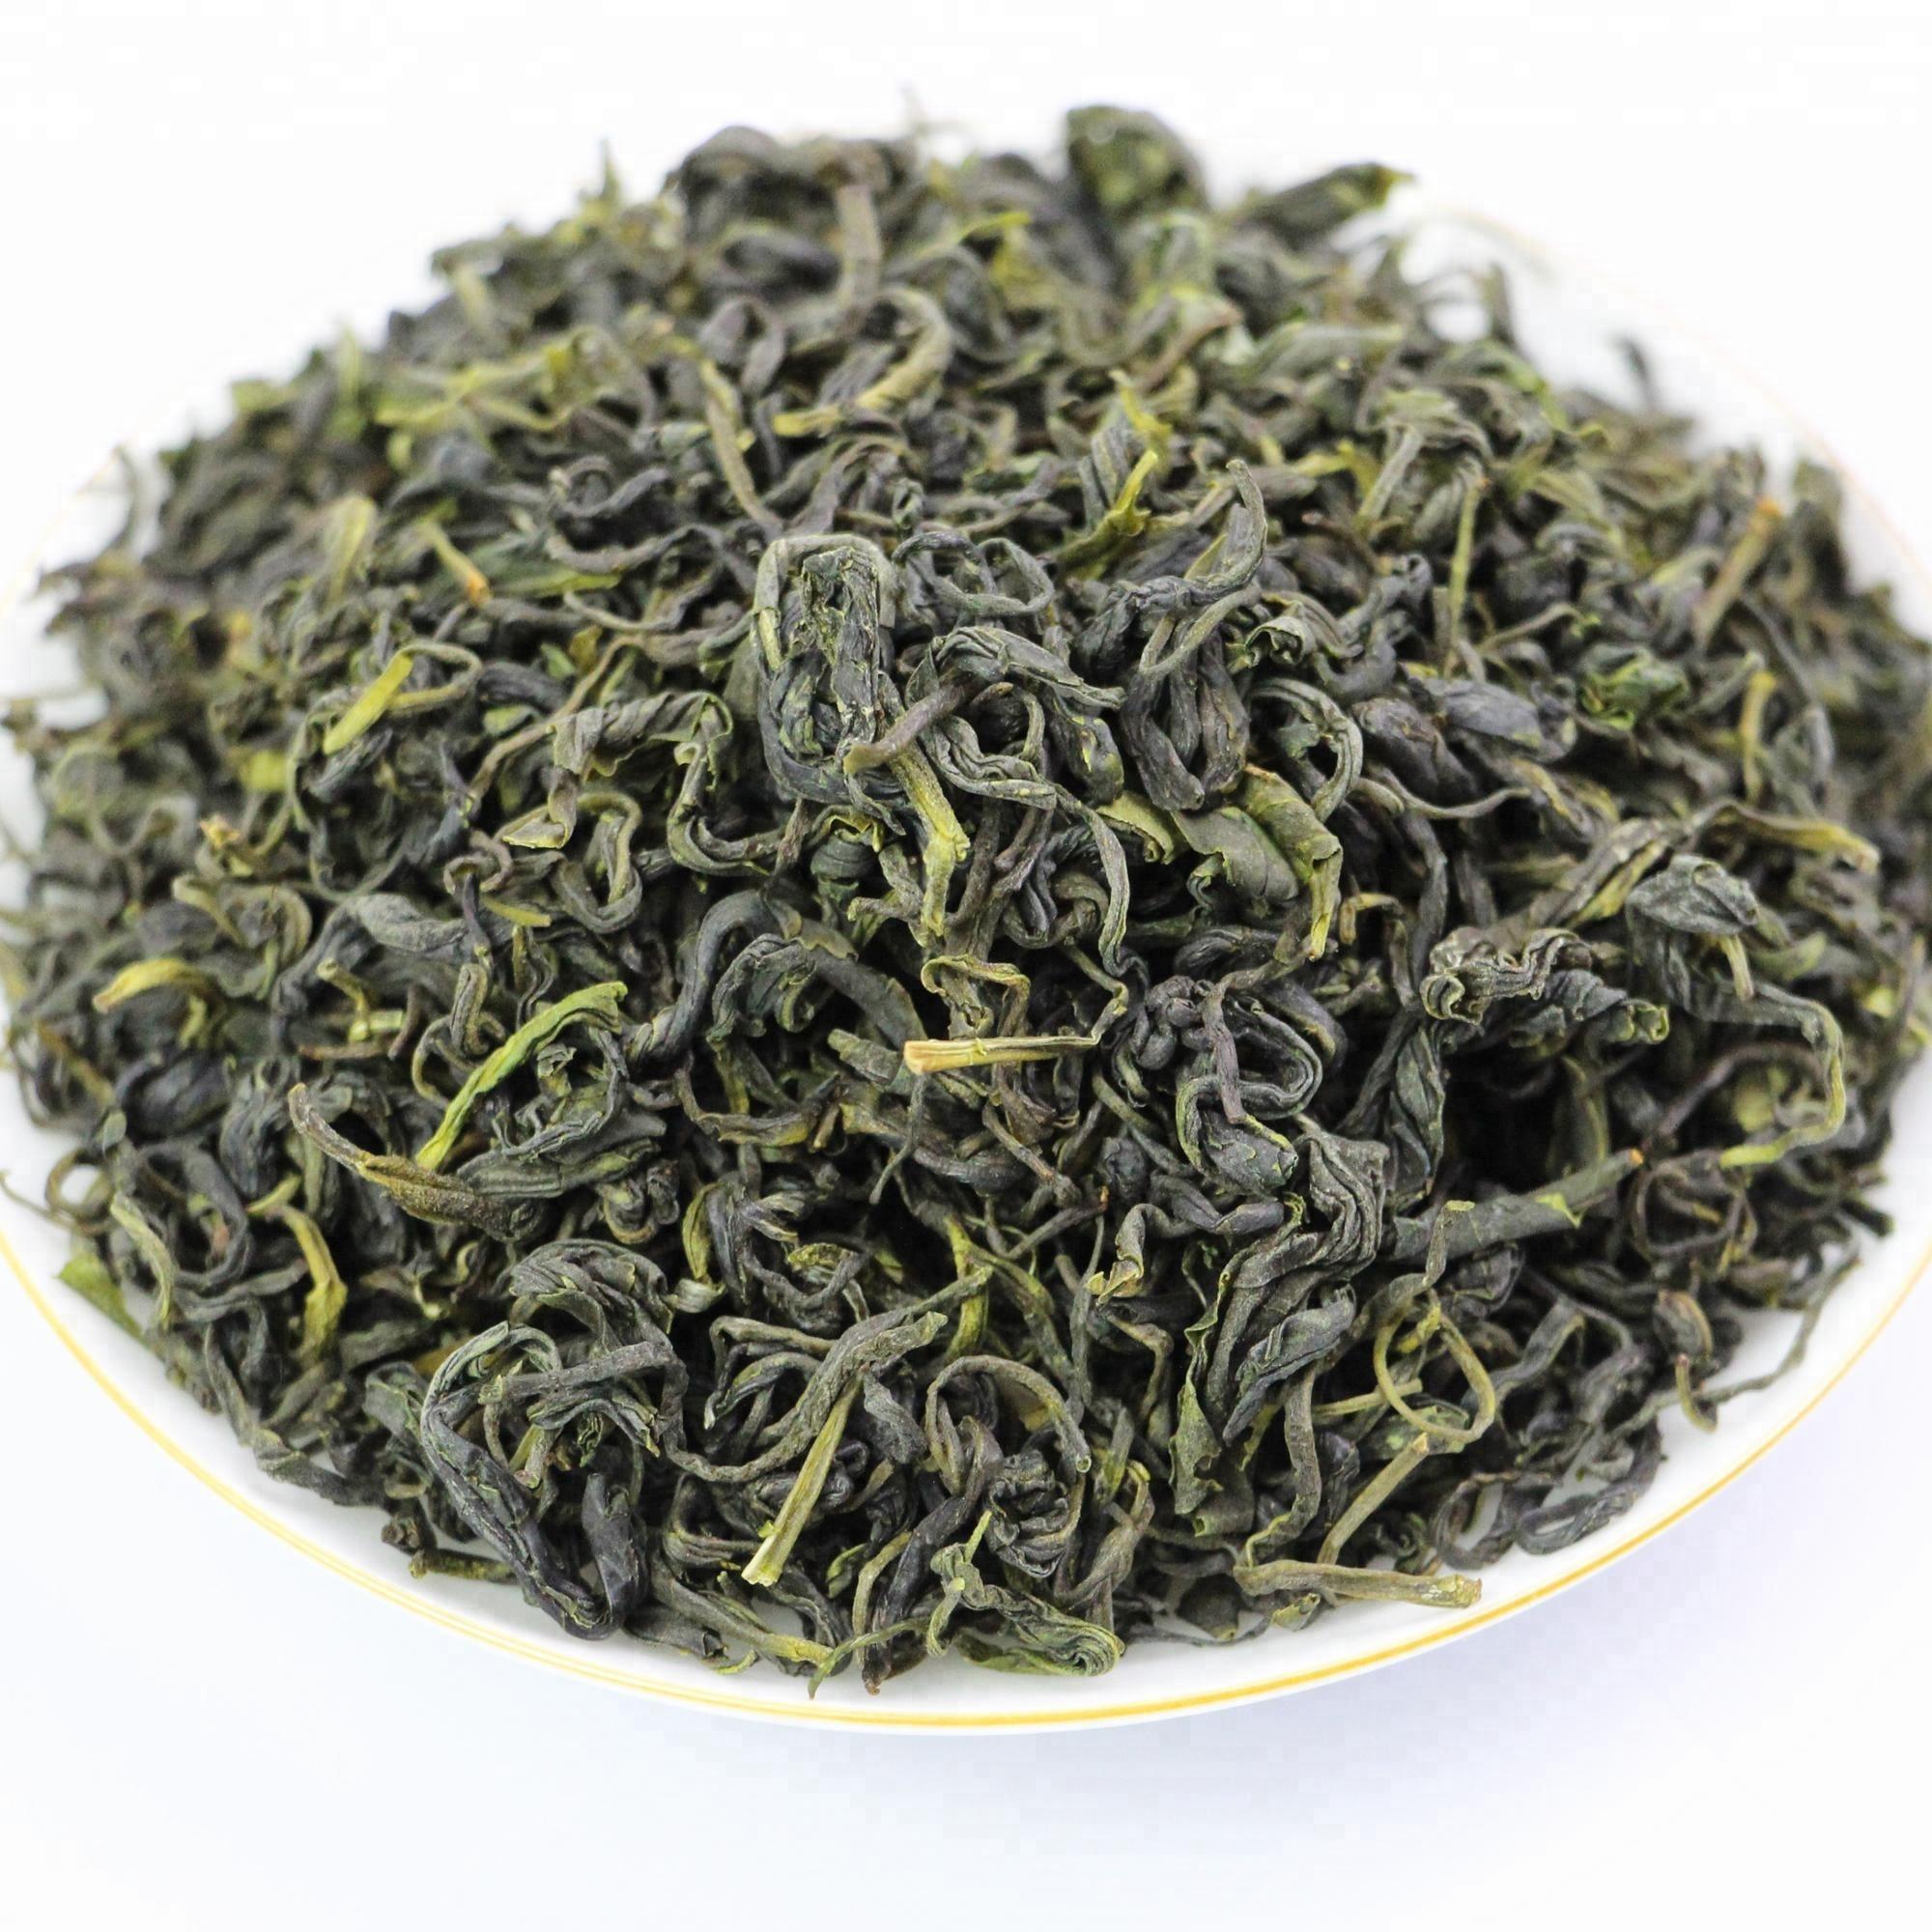 Tea internet shop tea information and types of tea green - 4uTea | 4uTea.com